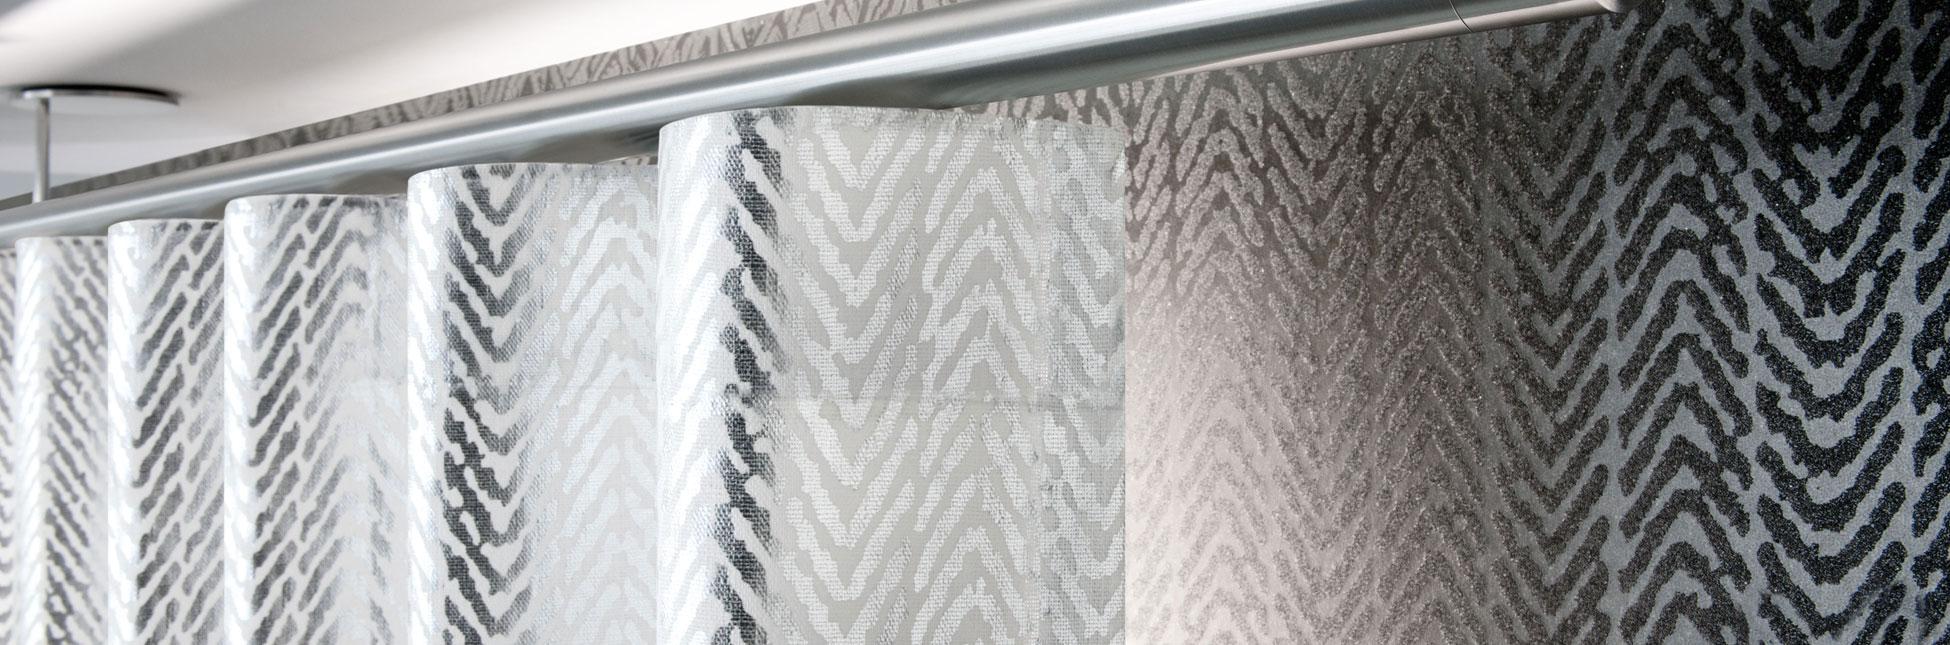 biermanns-raumdesign-gardinen